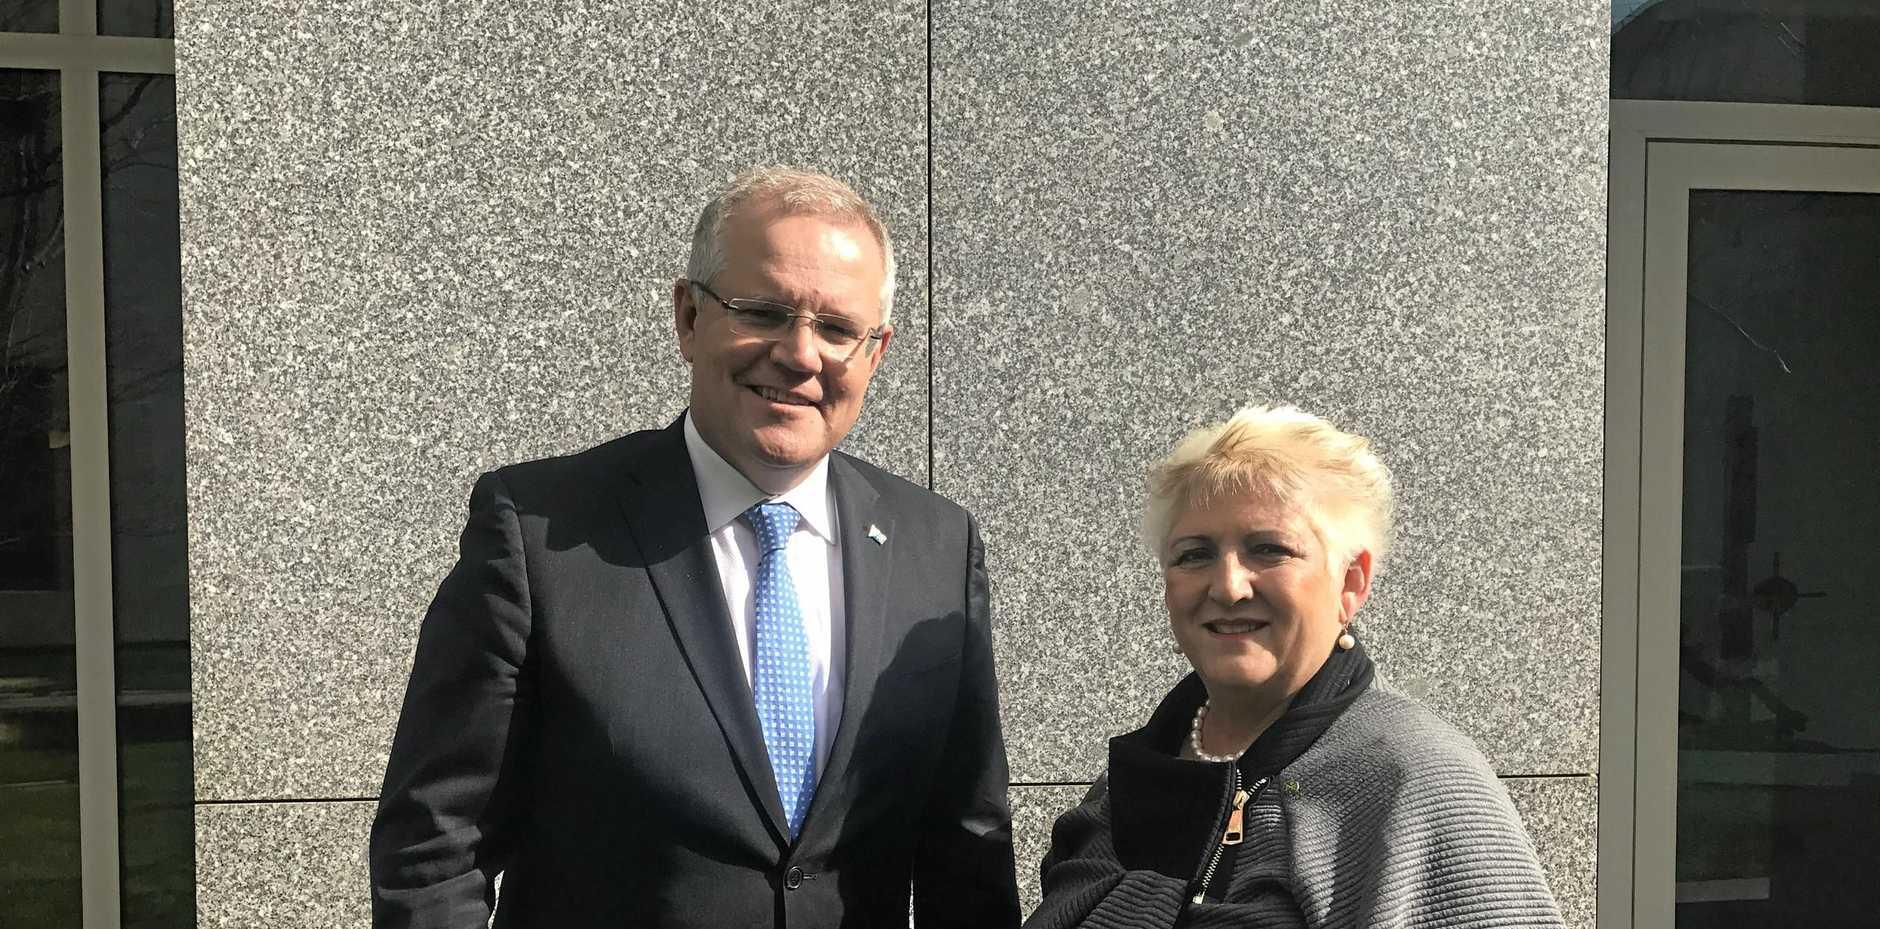 Michelle Landry has been in talks with Treasurer Scott Morrison